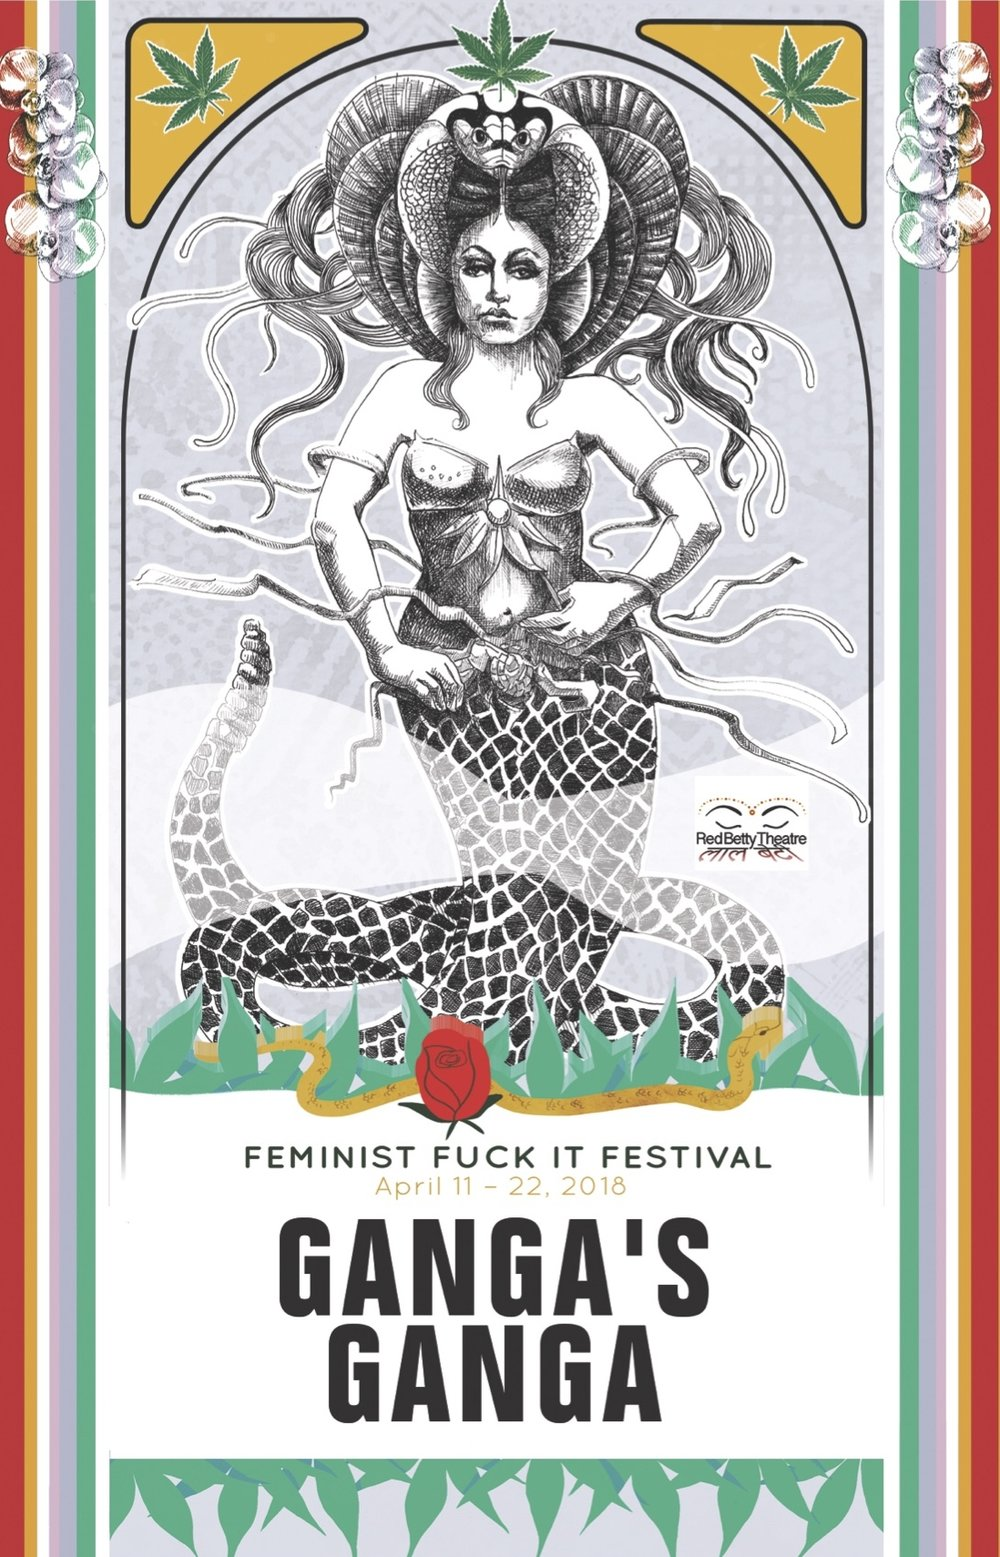 ganga-ganja-feminist-festival-fuck-it-toronto.jpg